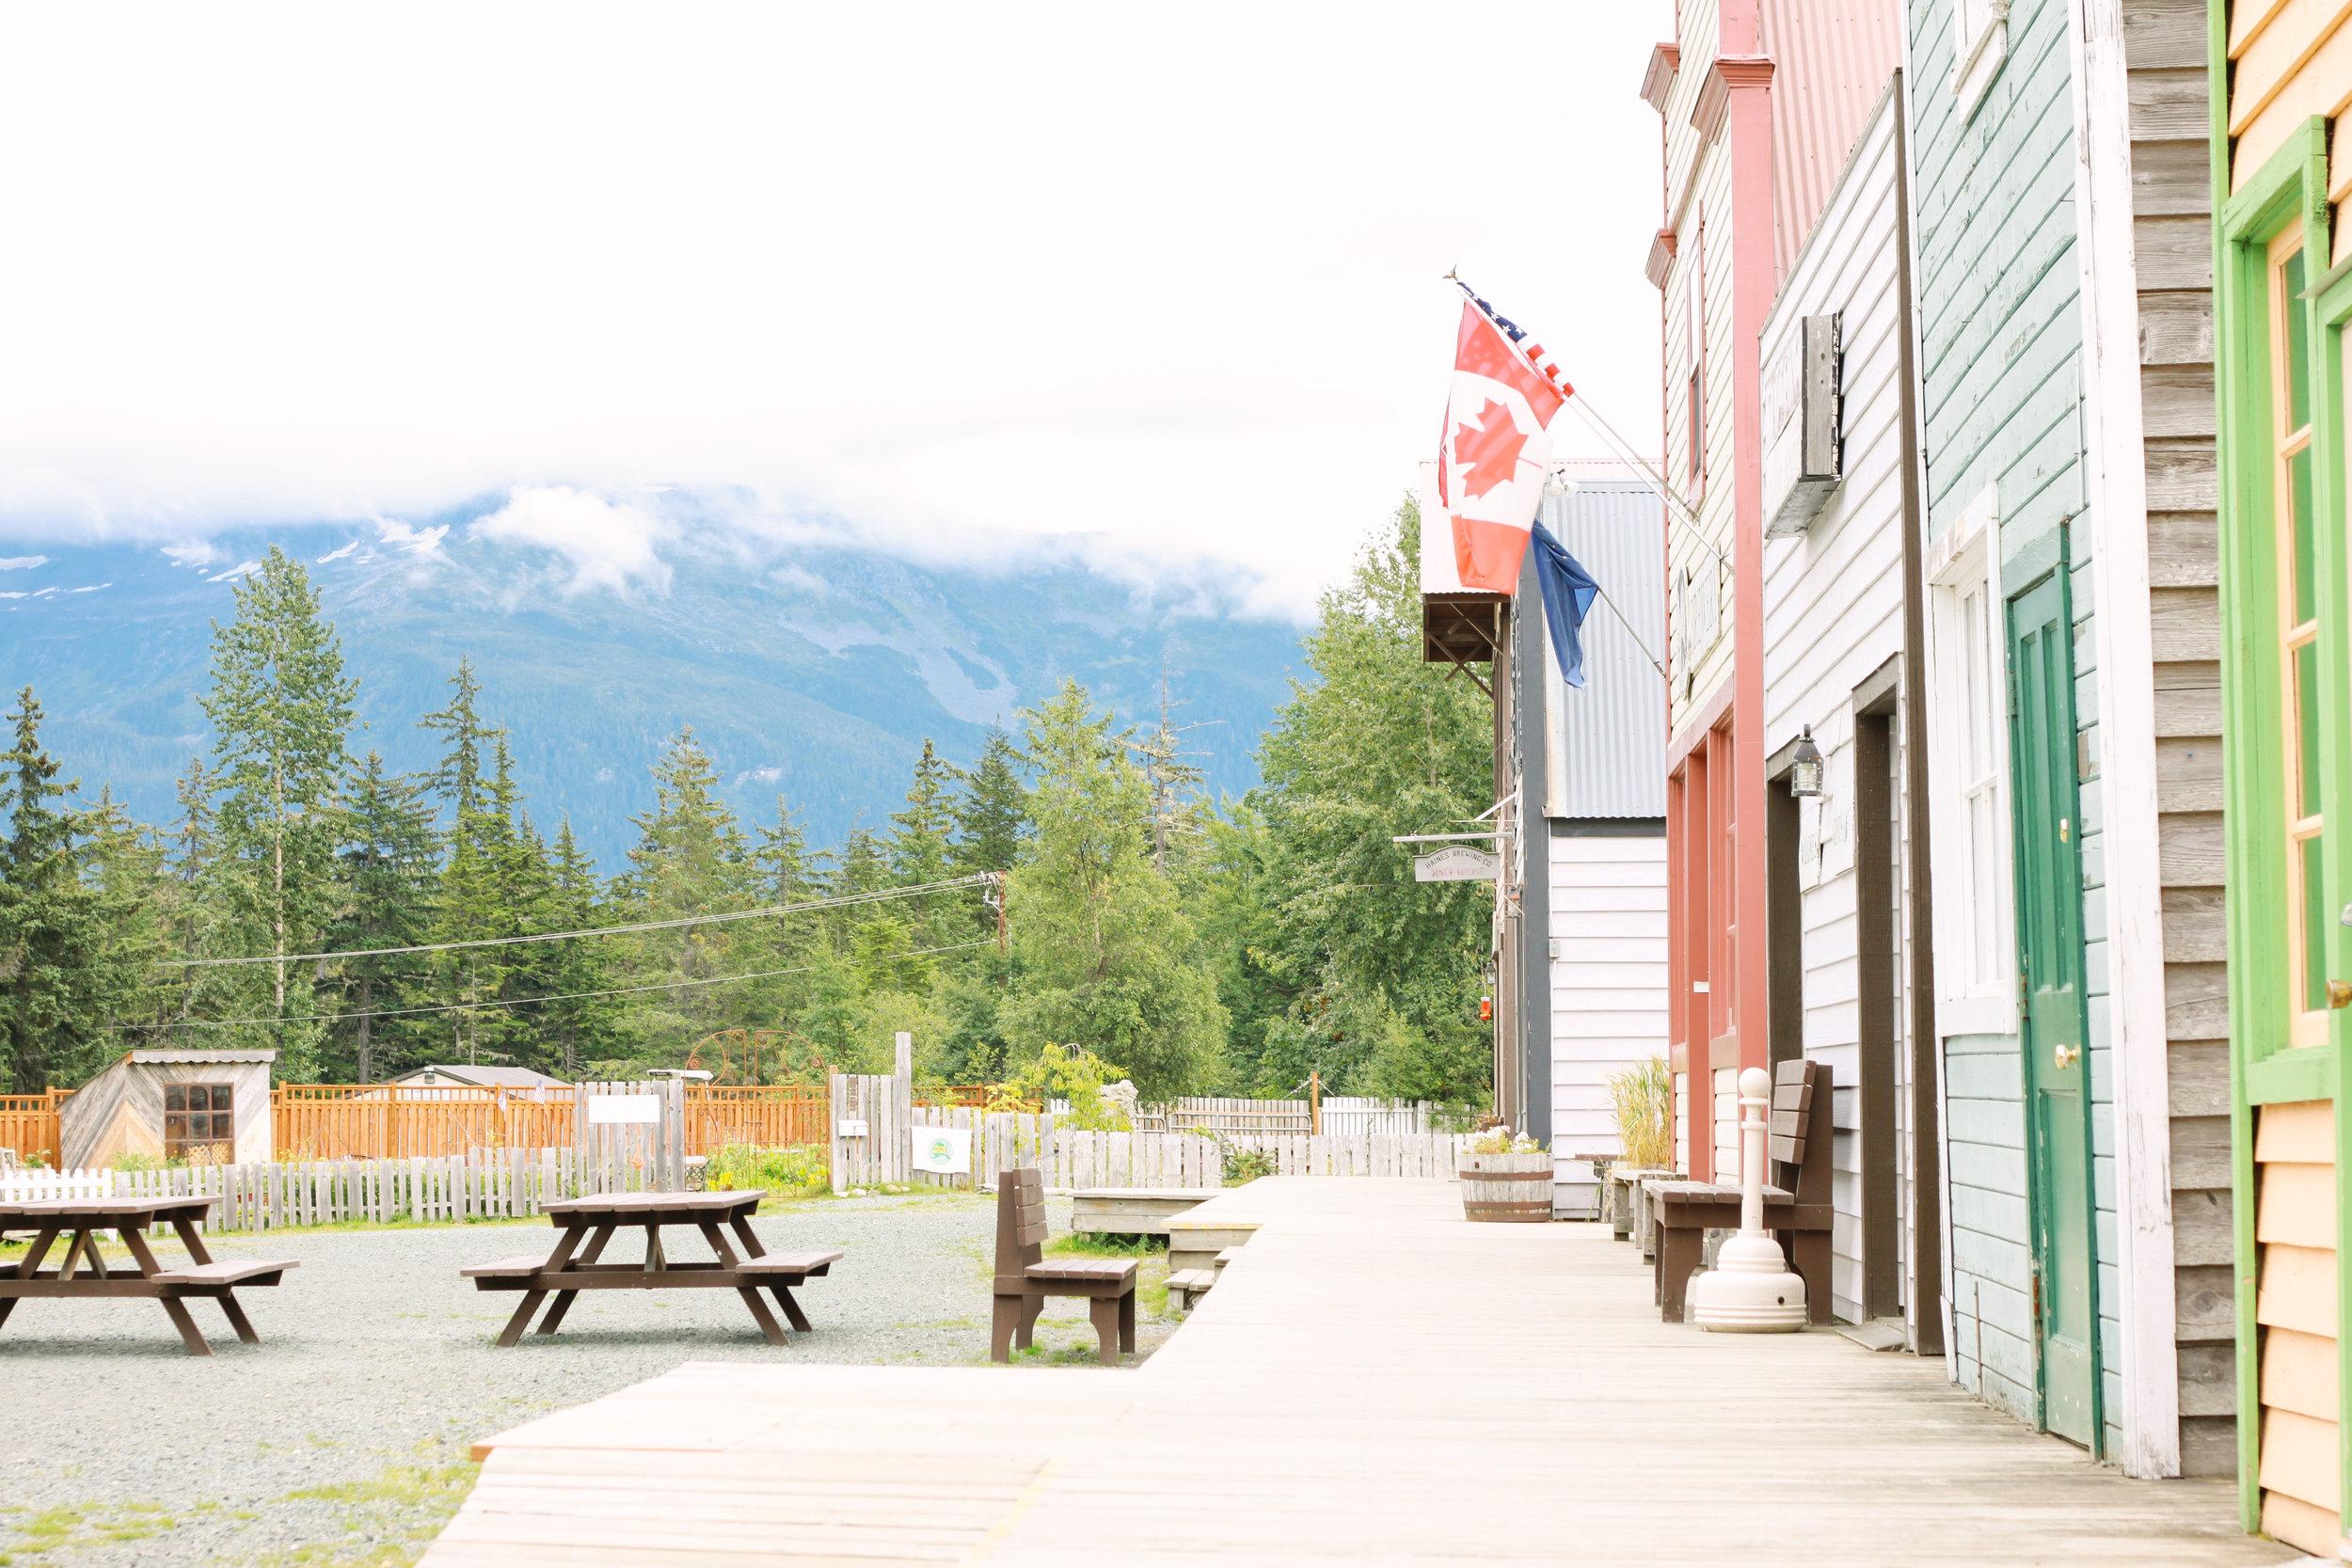 Haines, Alaska Travel Blog   MALLORIE OWENS